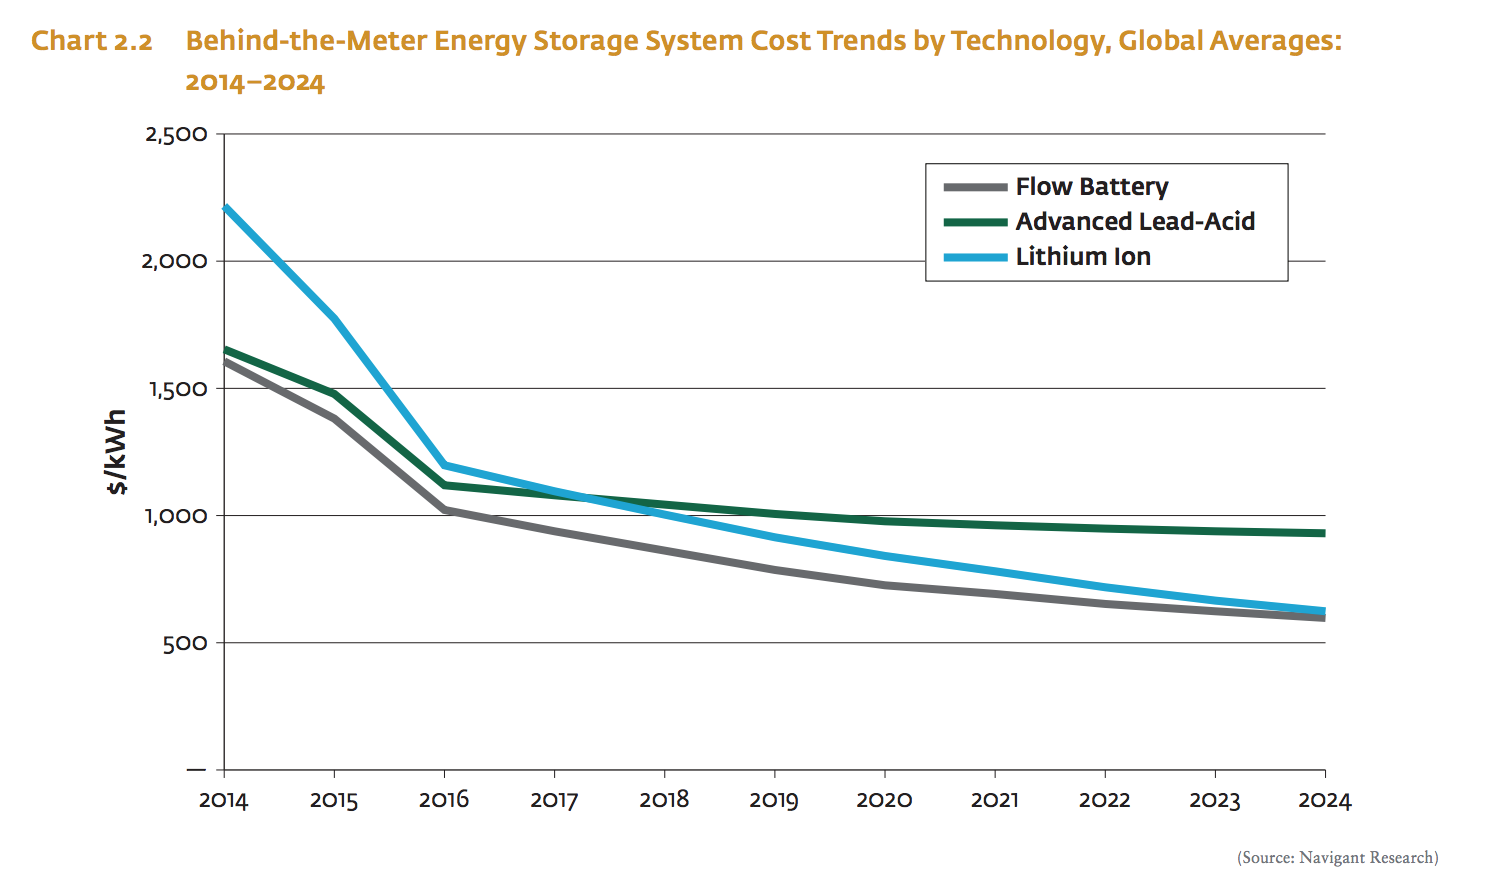 Electricity Storage – Behind the Meter